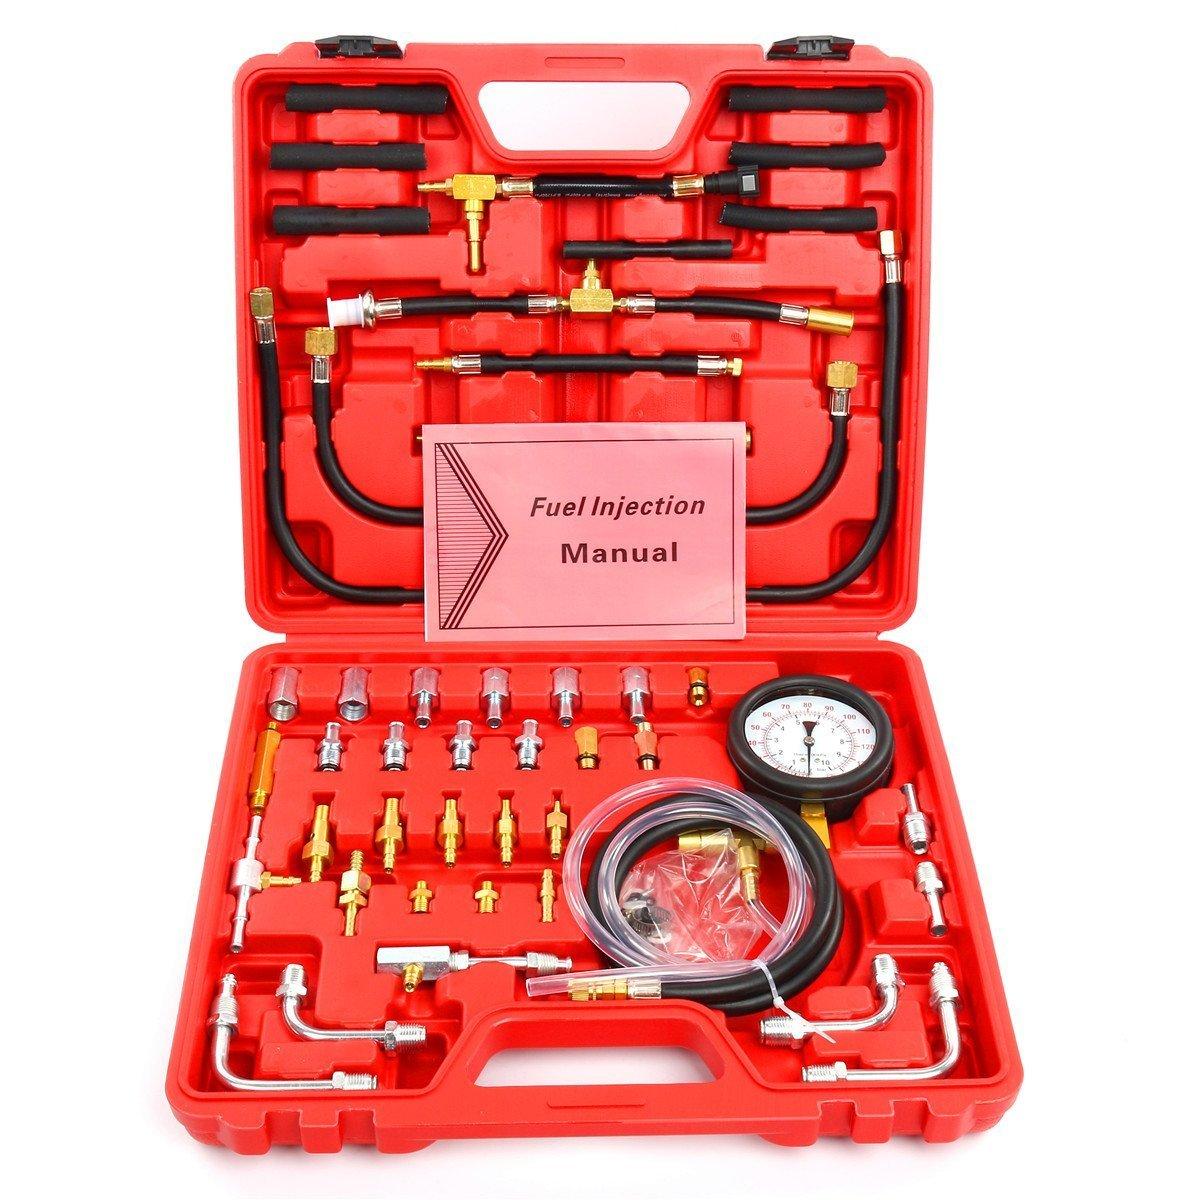 8MILELAKE Pro Oil Fuel Injection Pressure Tester Kit 0-140 PSI System by 8MILELAKE (Image #2)